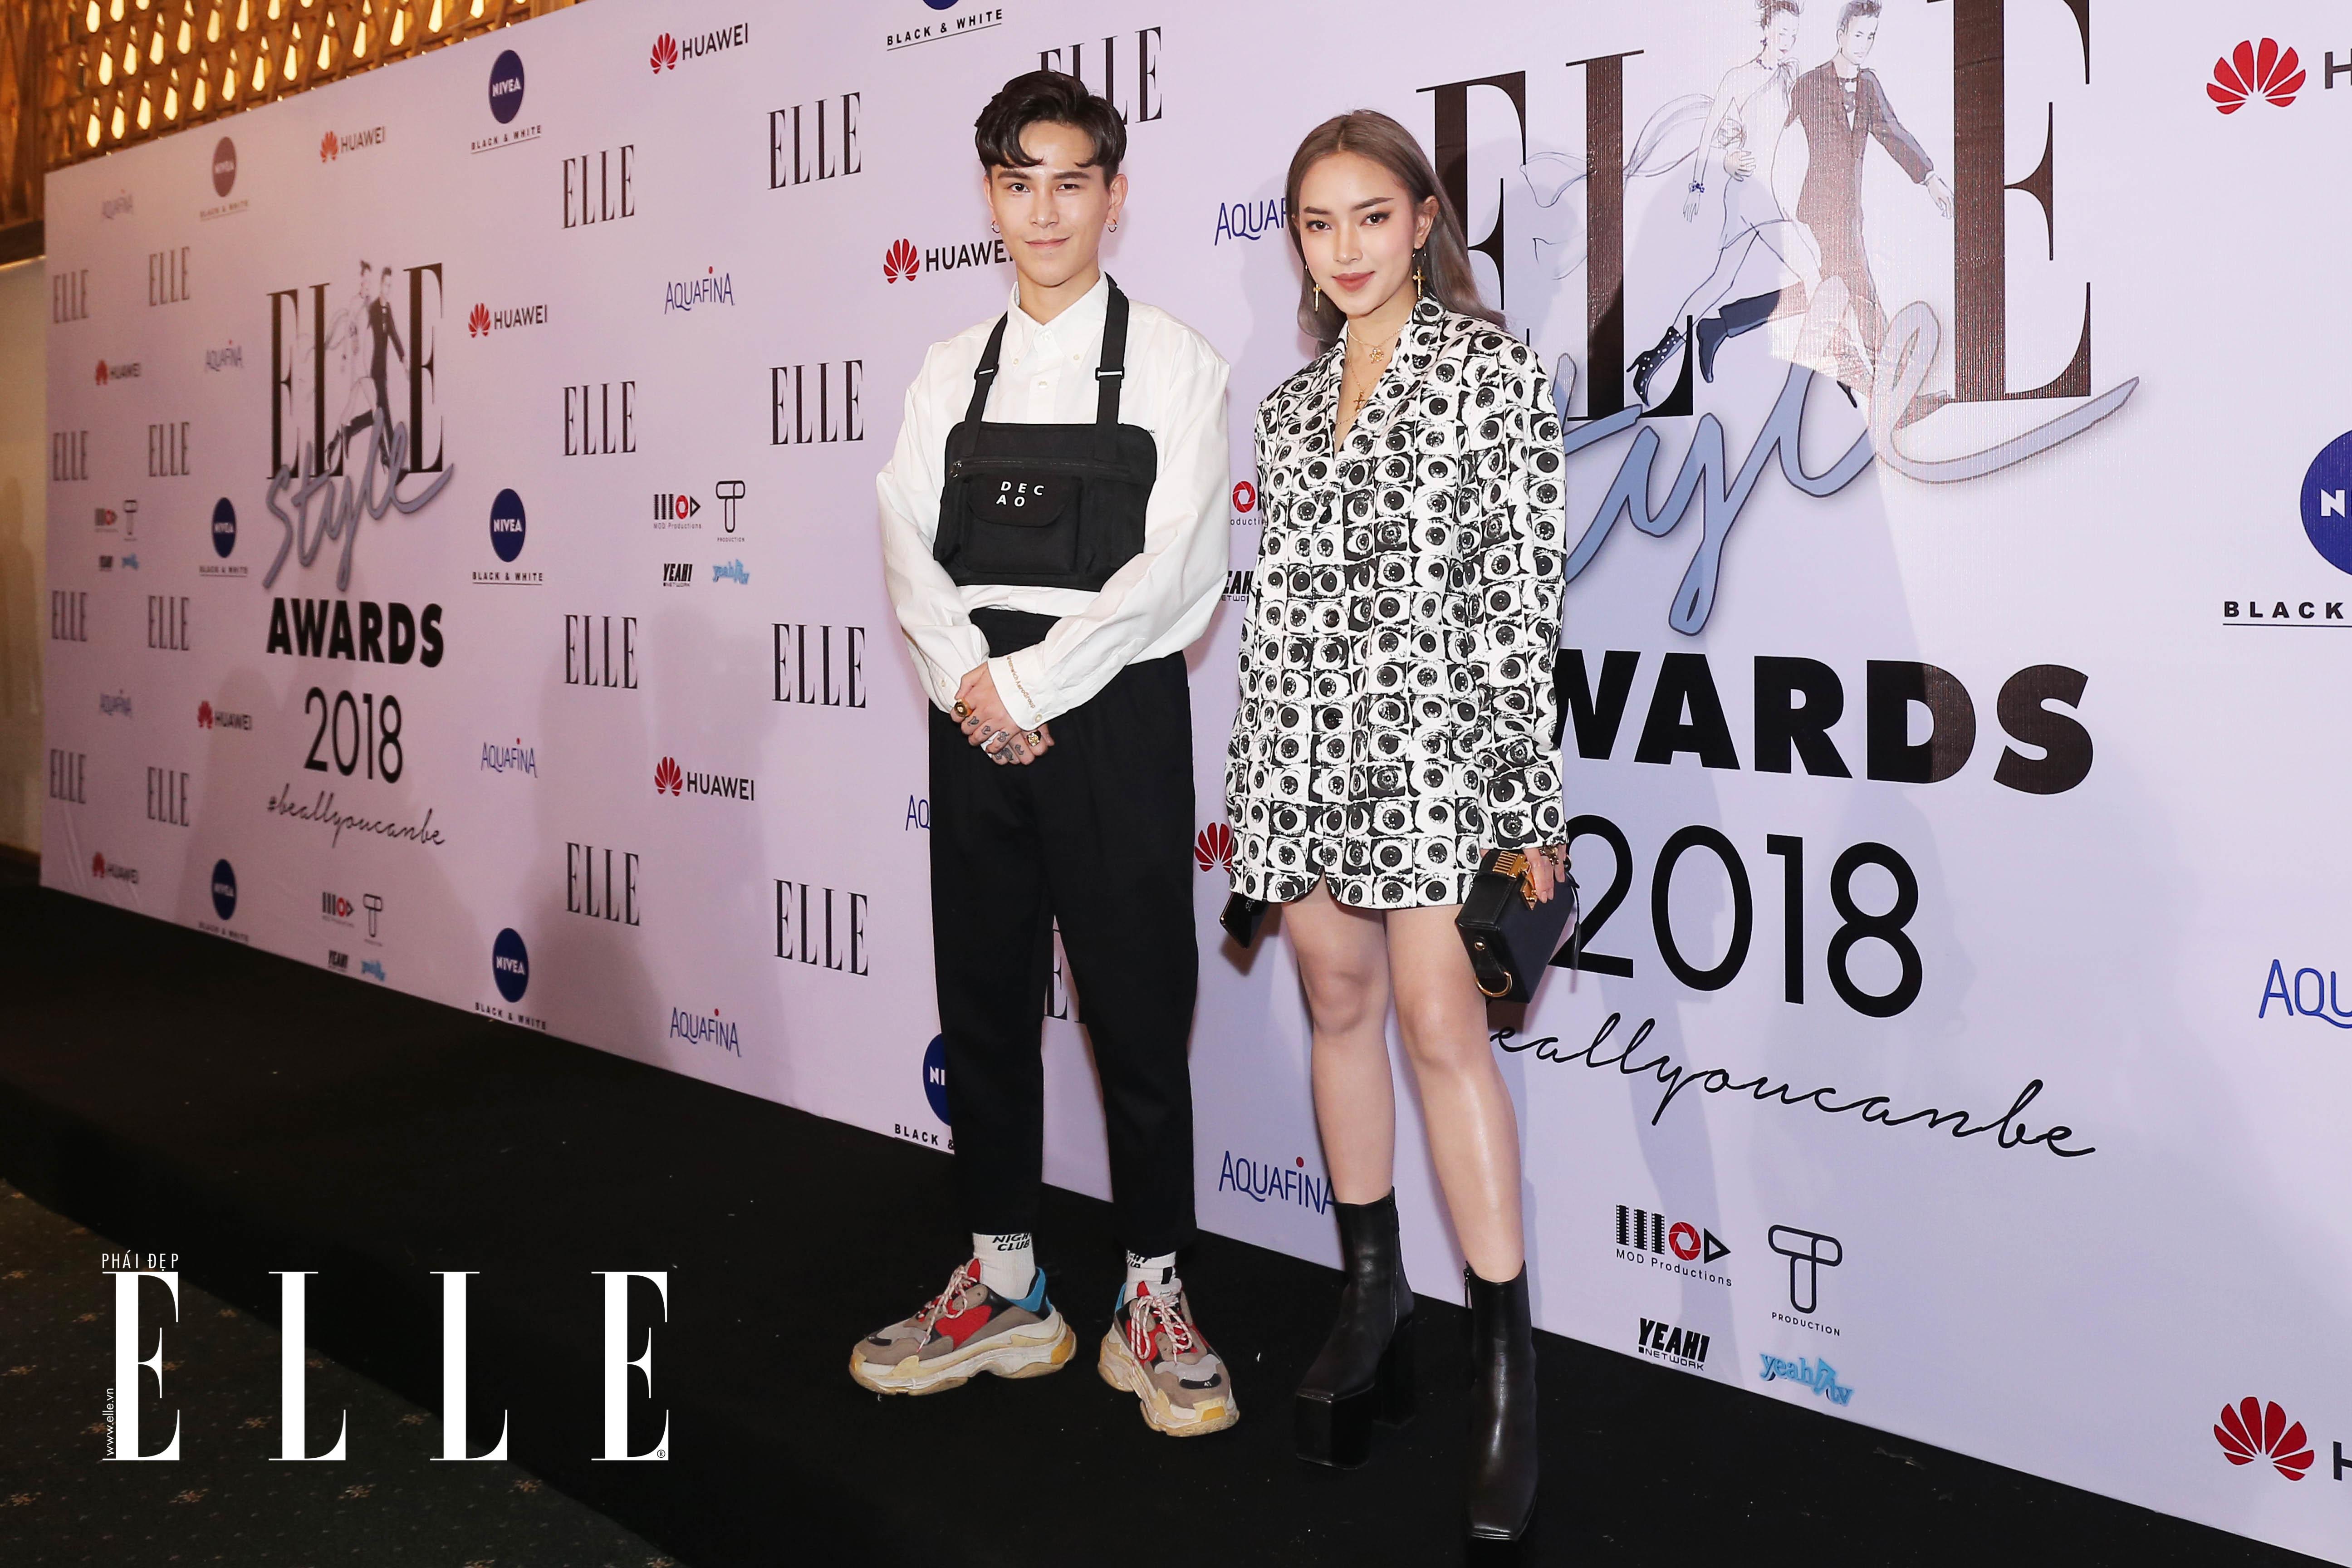 châu bùi elle style awards 12